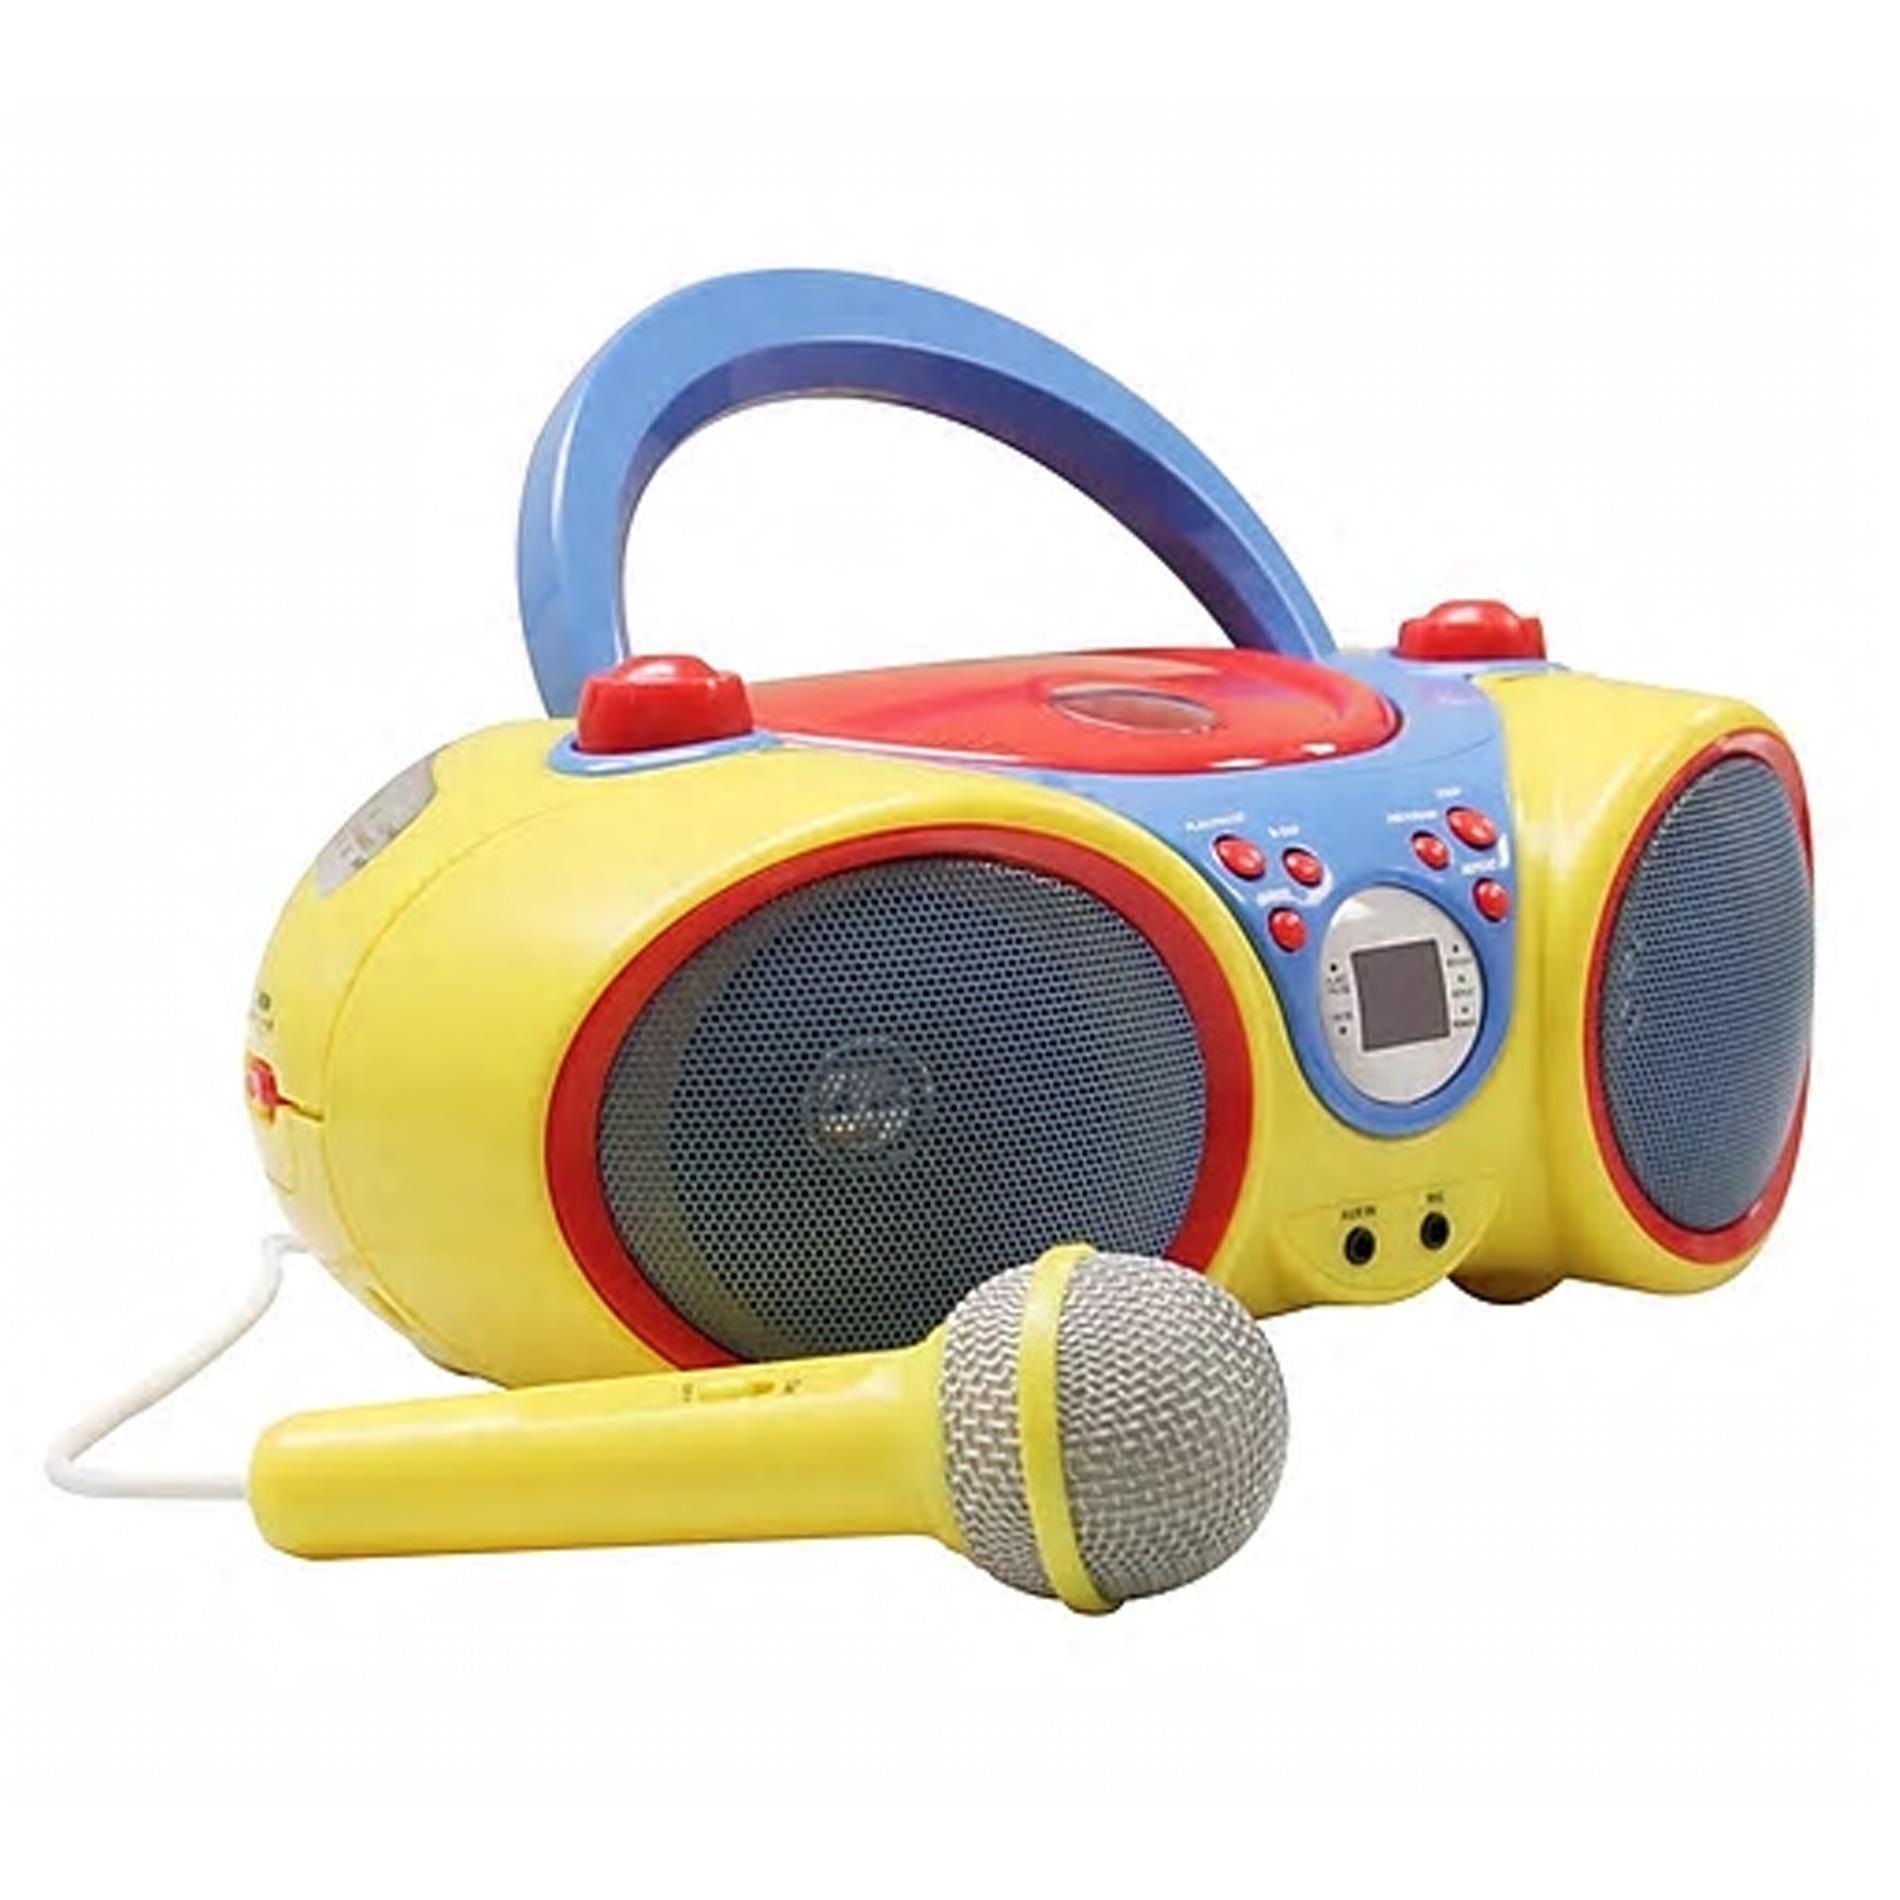 HamiltonBuhl Kids Audio CD Player Karaoke Machine with Microphone